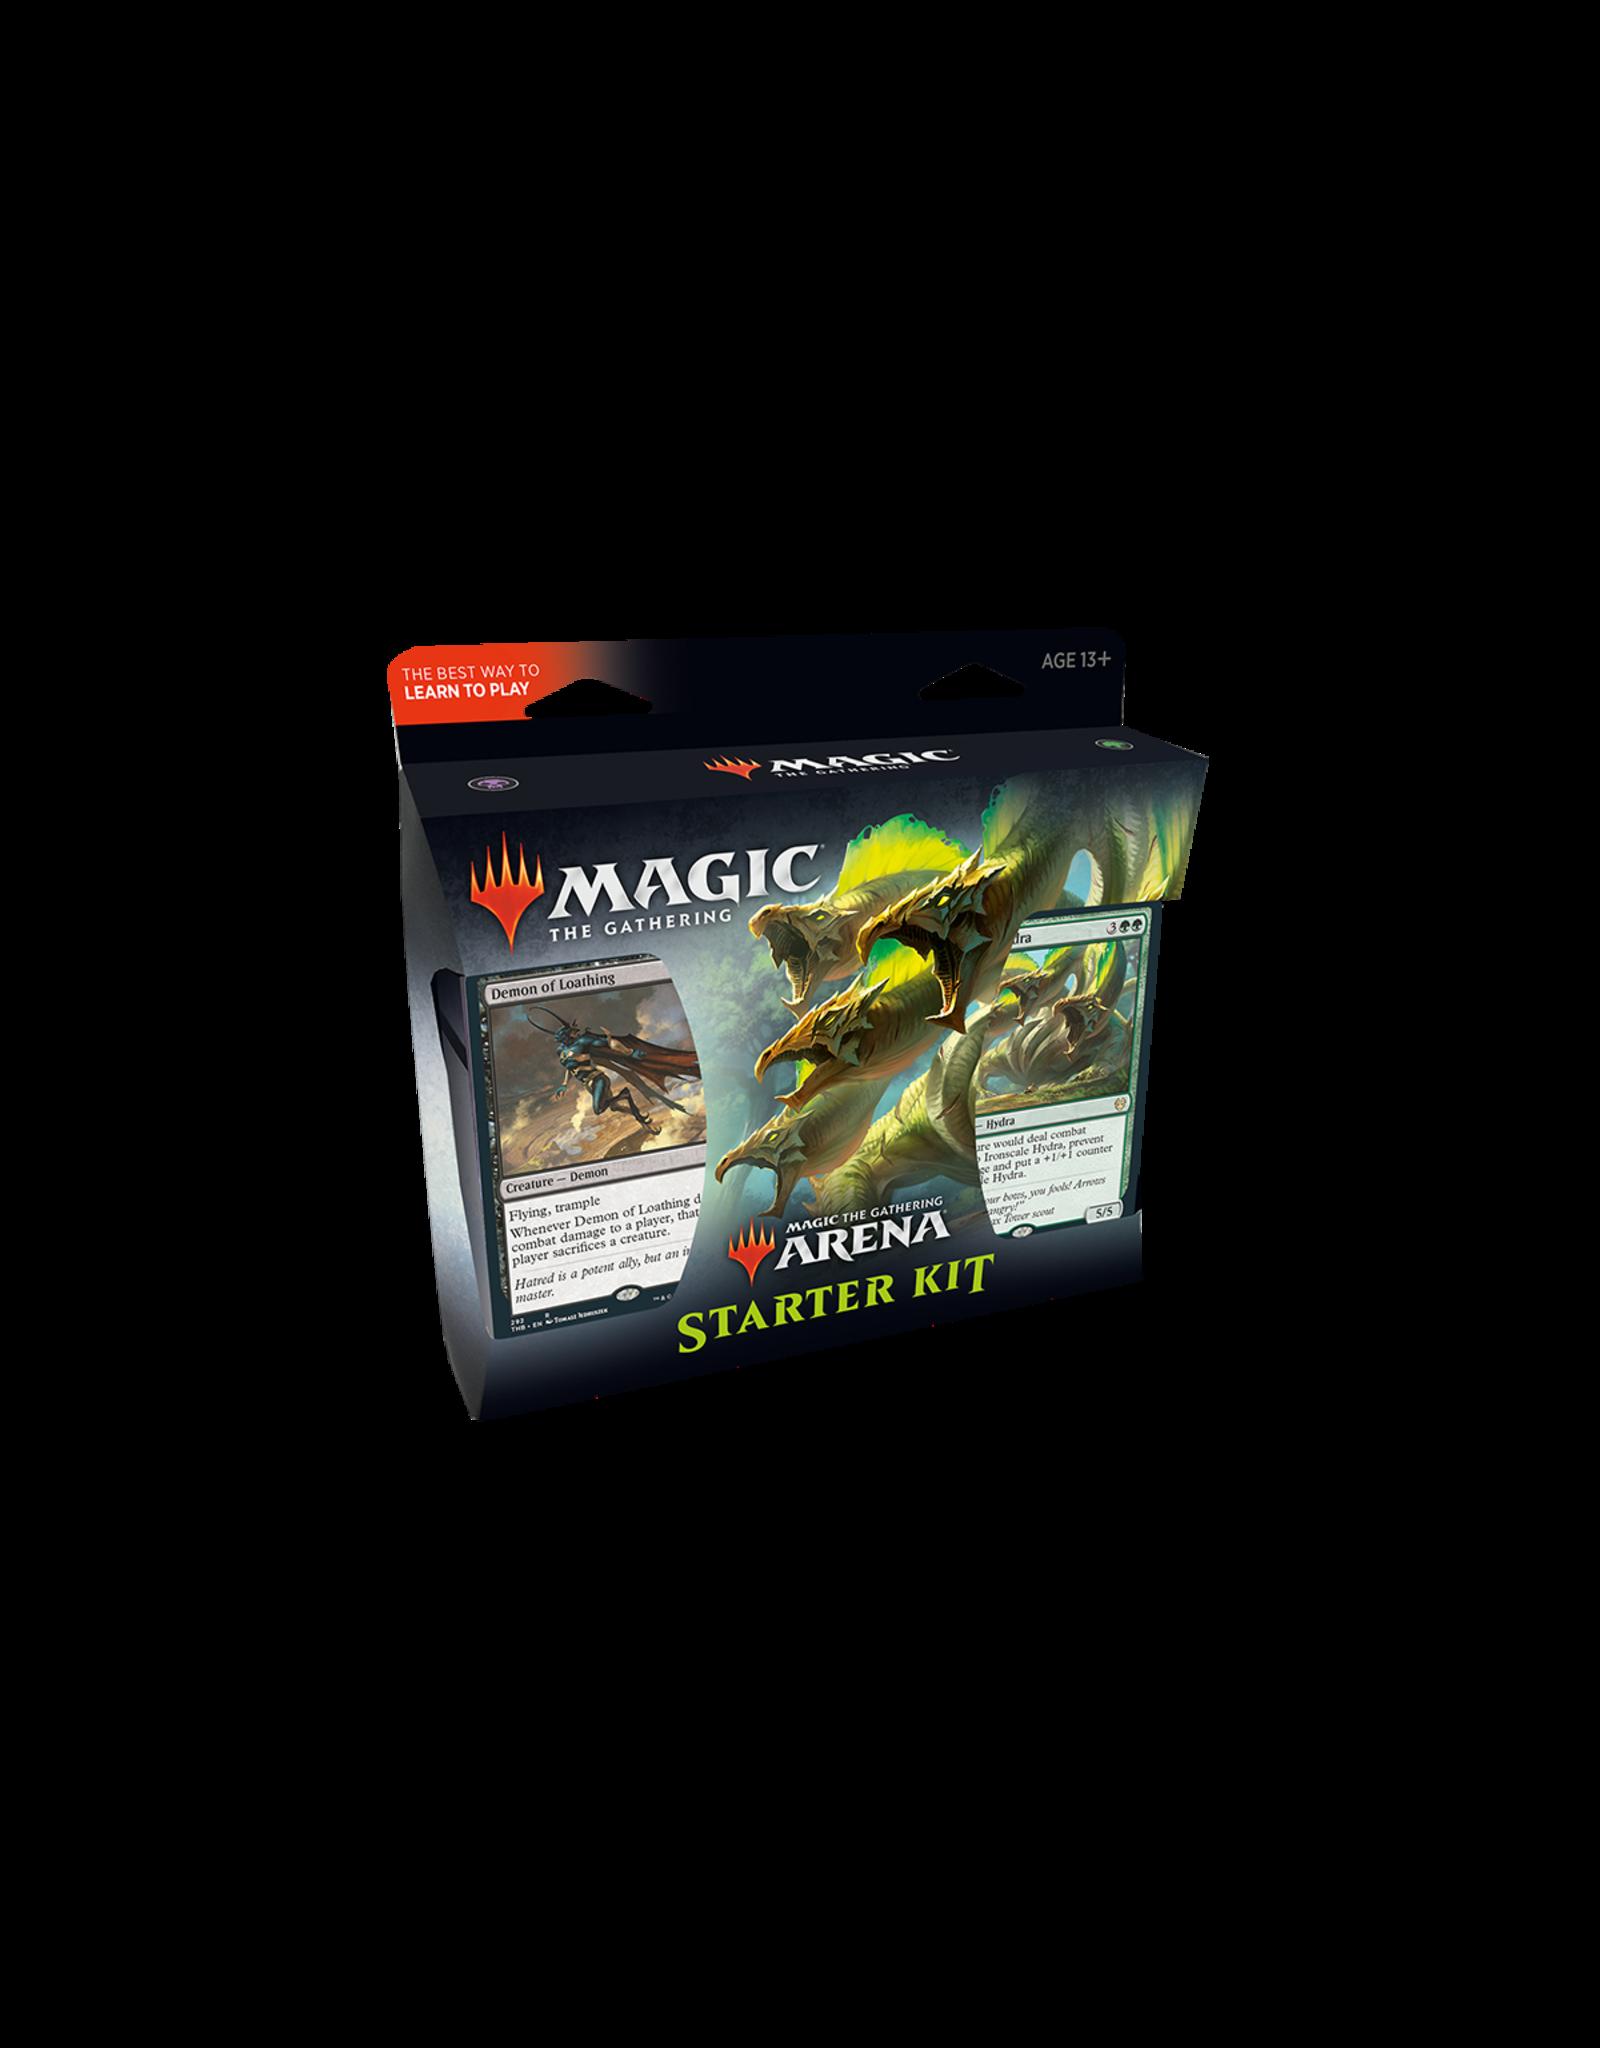 Magic: The Gathering Magic: The Gathering - Core Set 2021 - Arena Starter Kit